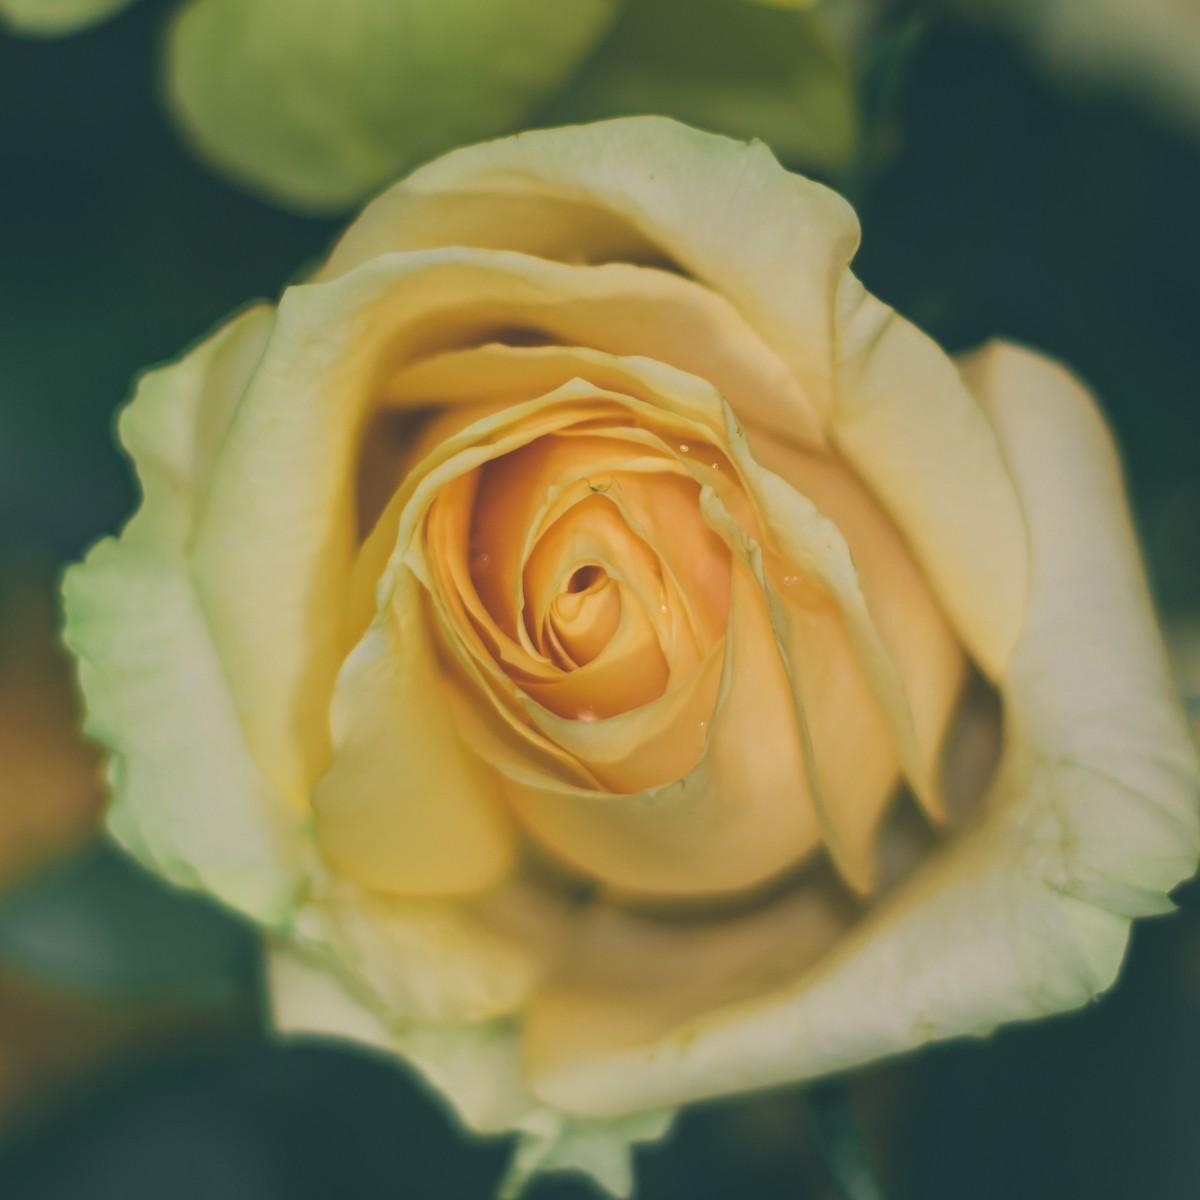 Garden Roses Flower Petal: Free Images : Flower, Petal, Close Up, Macro Photography